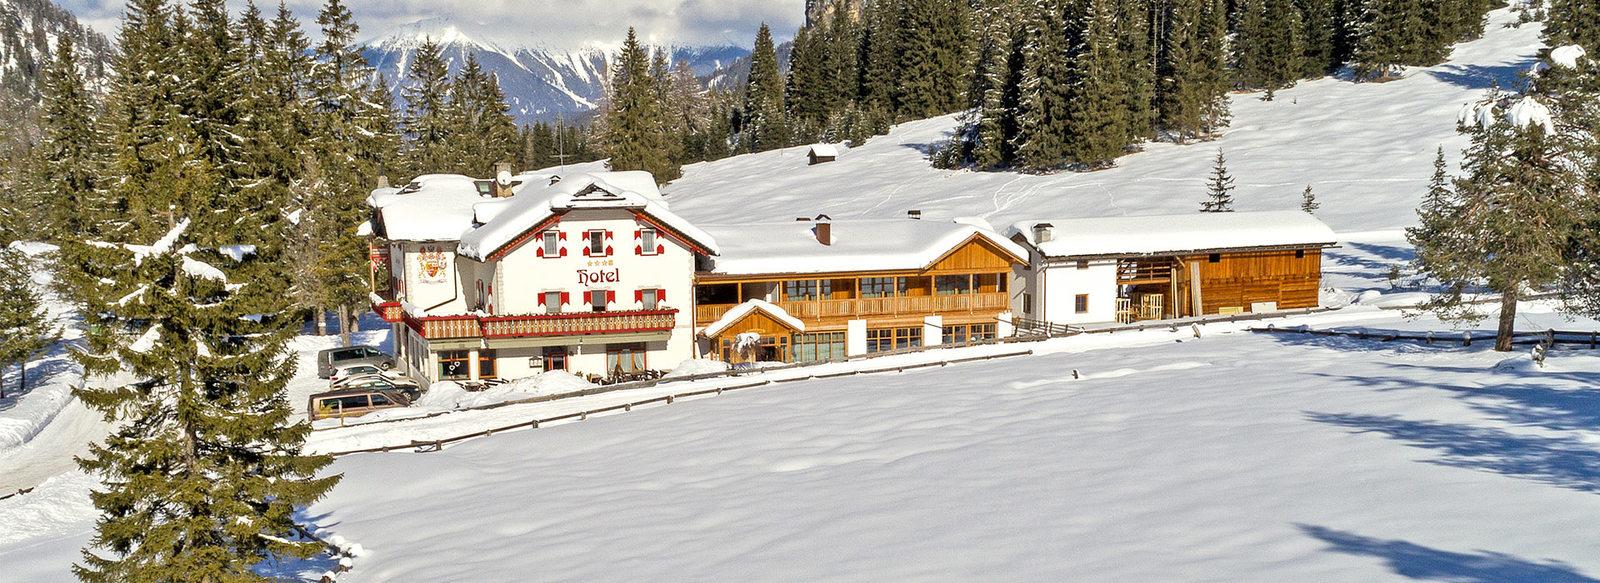 Hotel di lunga tradizione